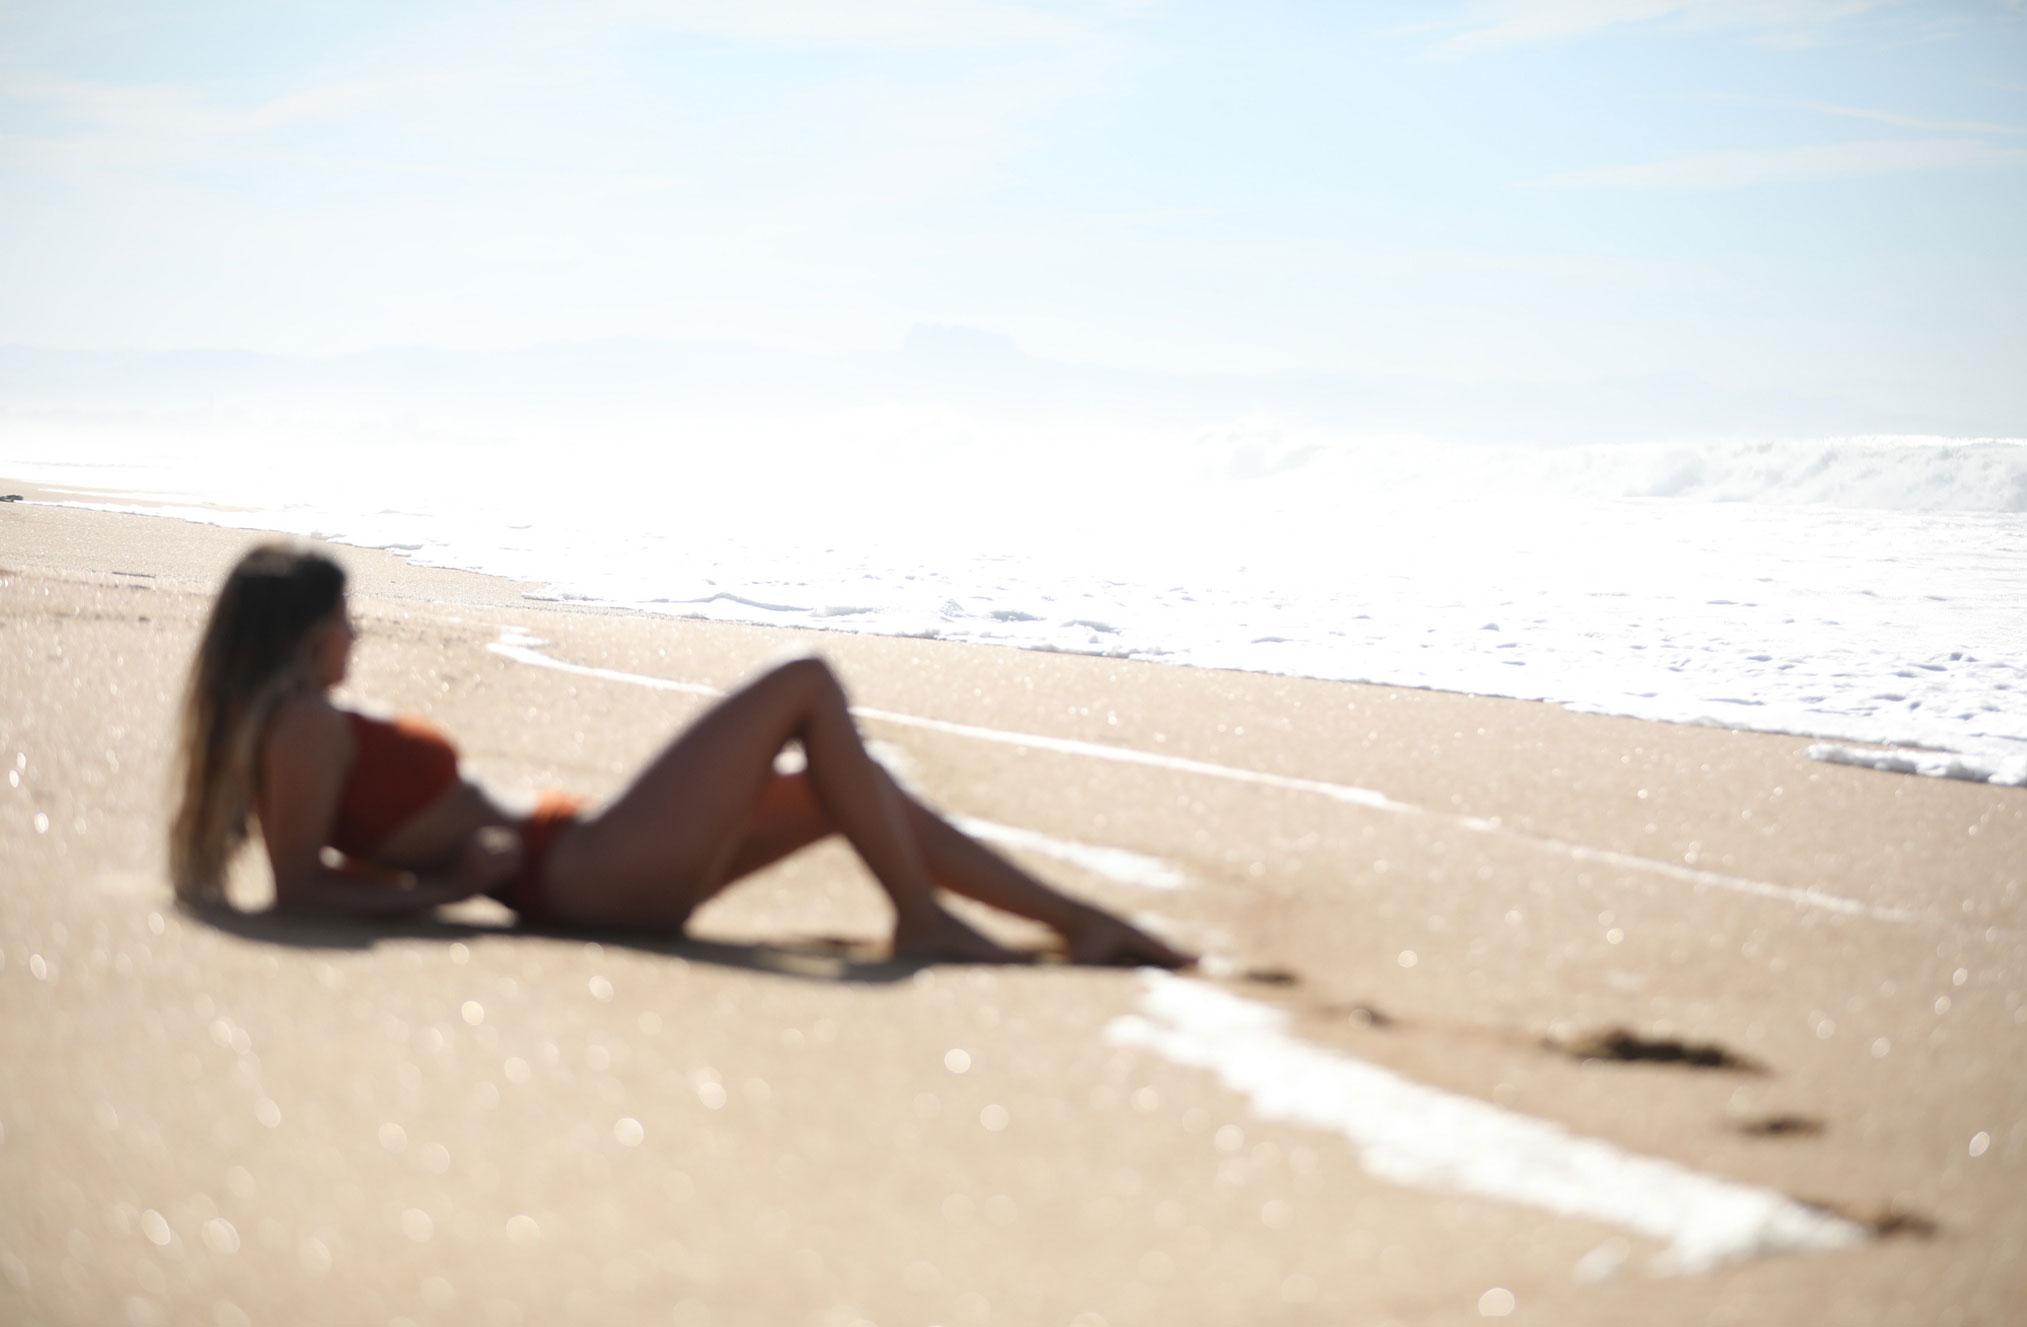 рекламная кампания французского производителя косметики Laboratoire De Biarritz / фото 06